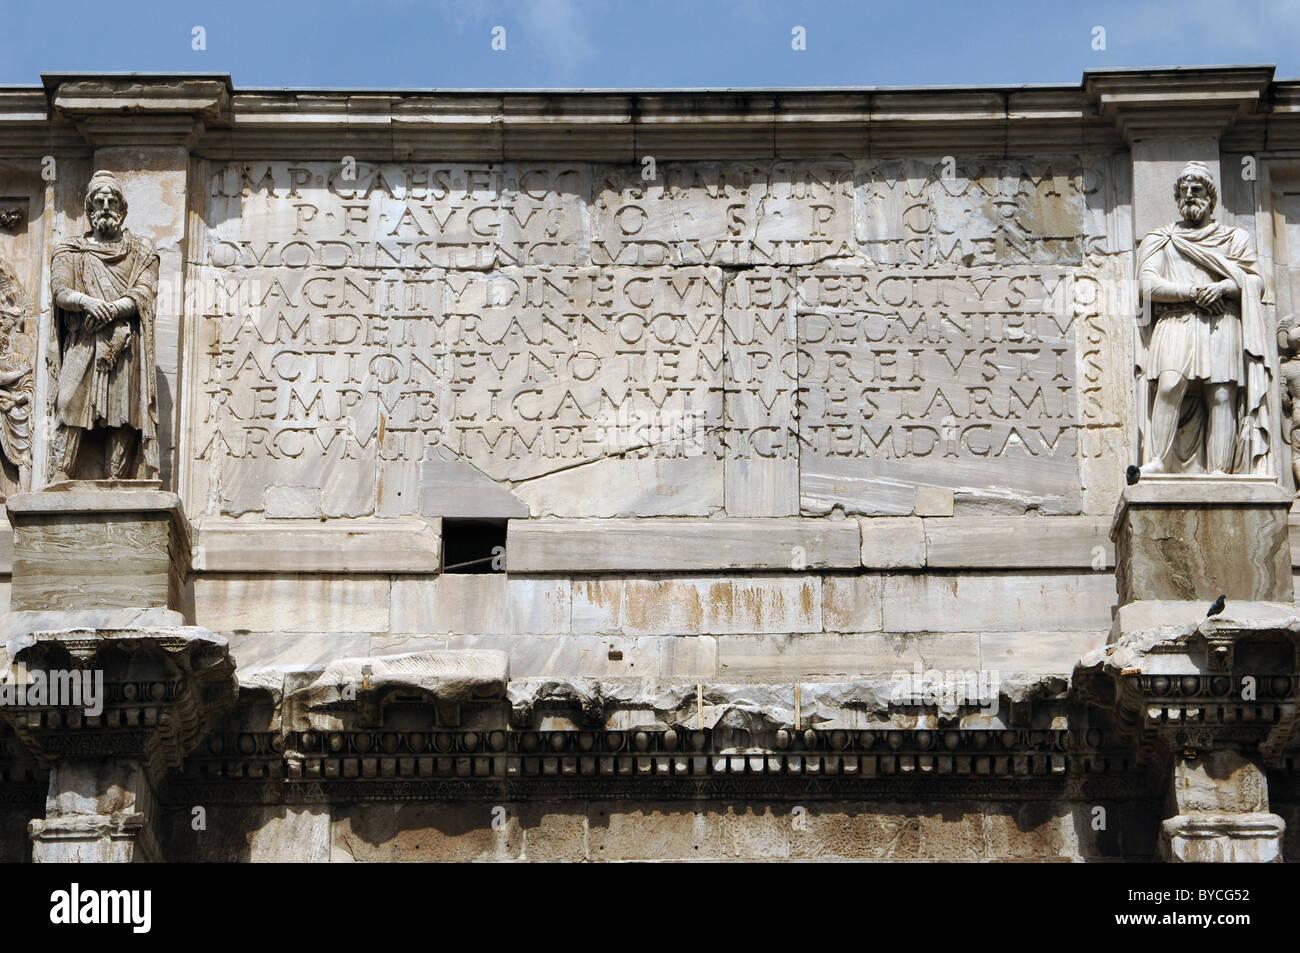 L'art romain Arc de Constantin. Inscription latine. Rome. L'Italie. Photo Stock